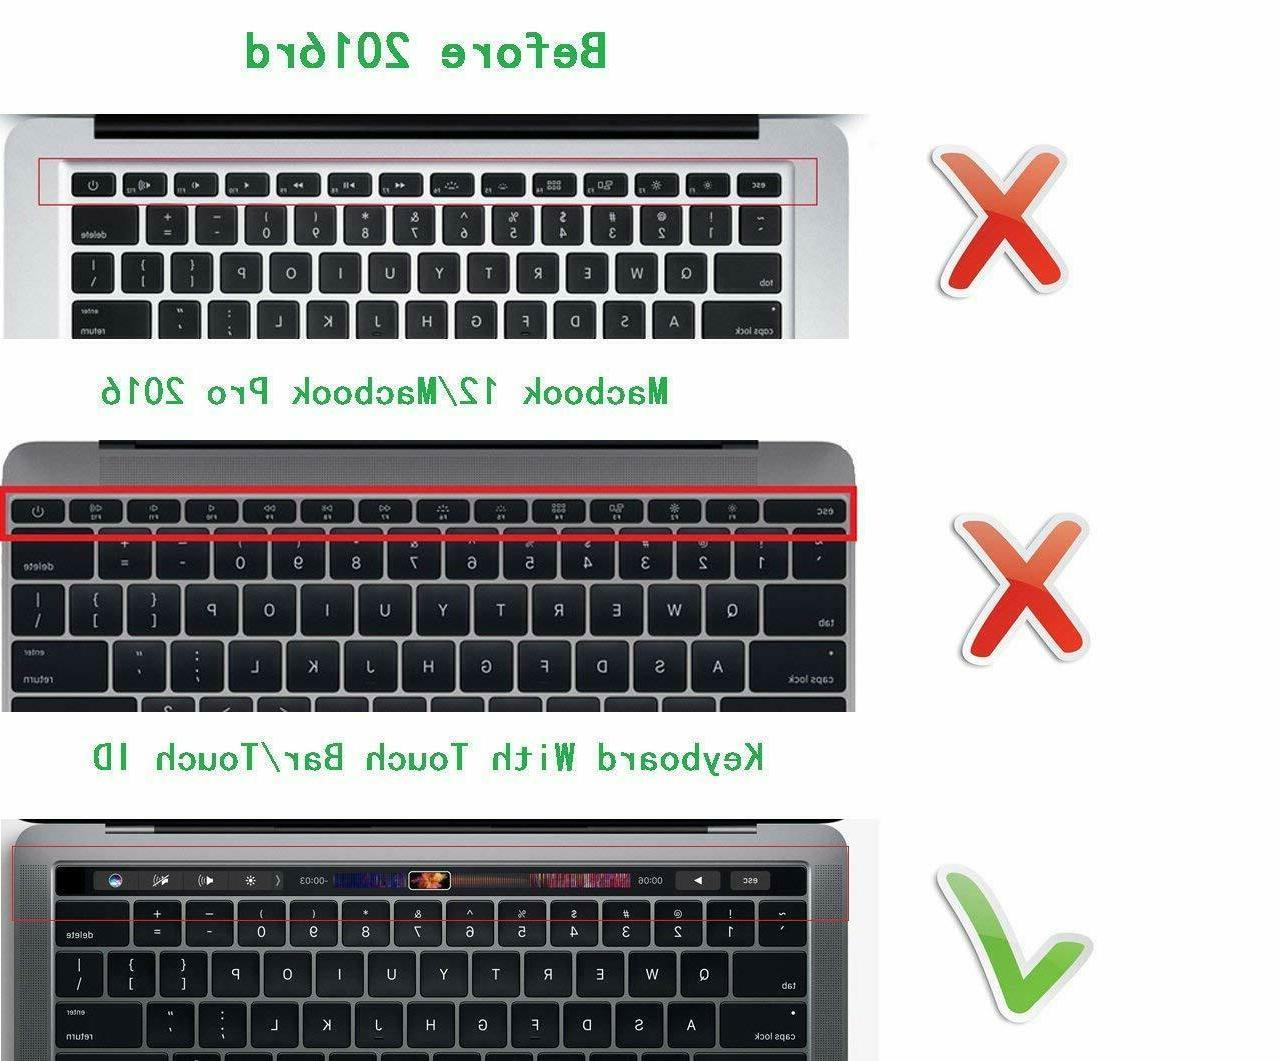 Keyboard DJ Functional Hot Key Shortcut Macbook 13 15